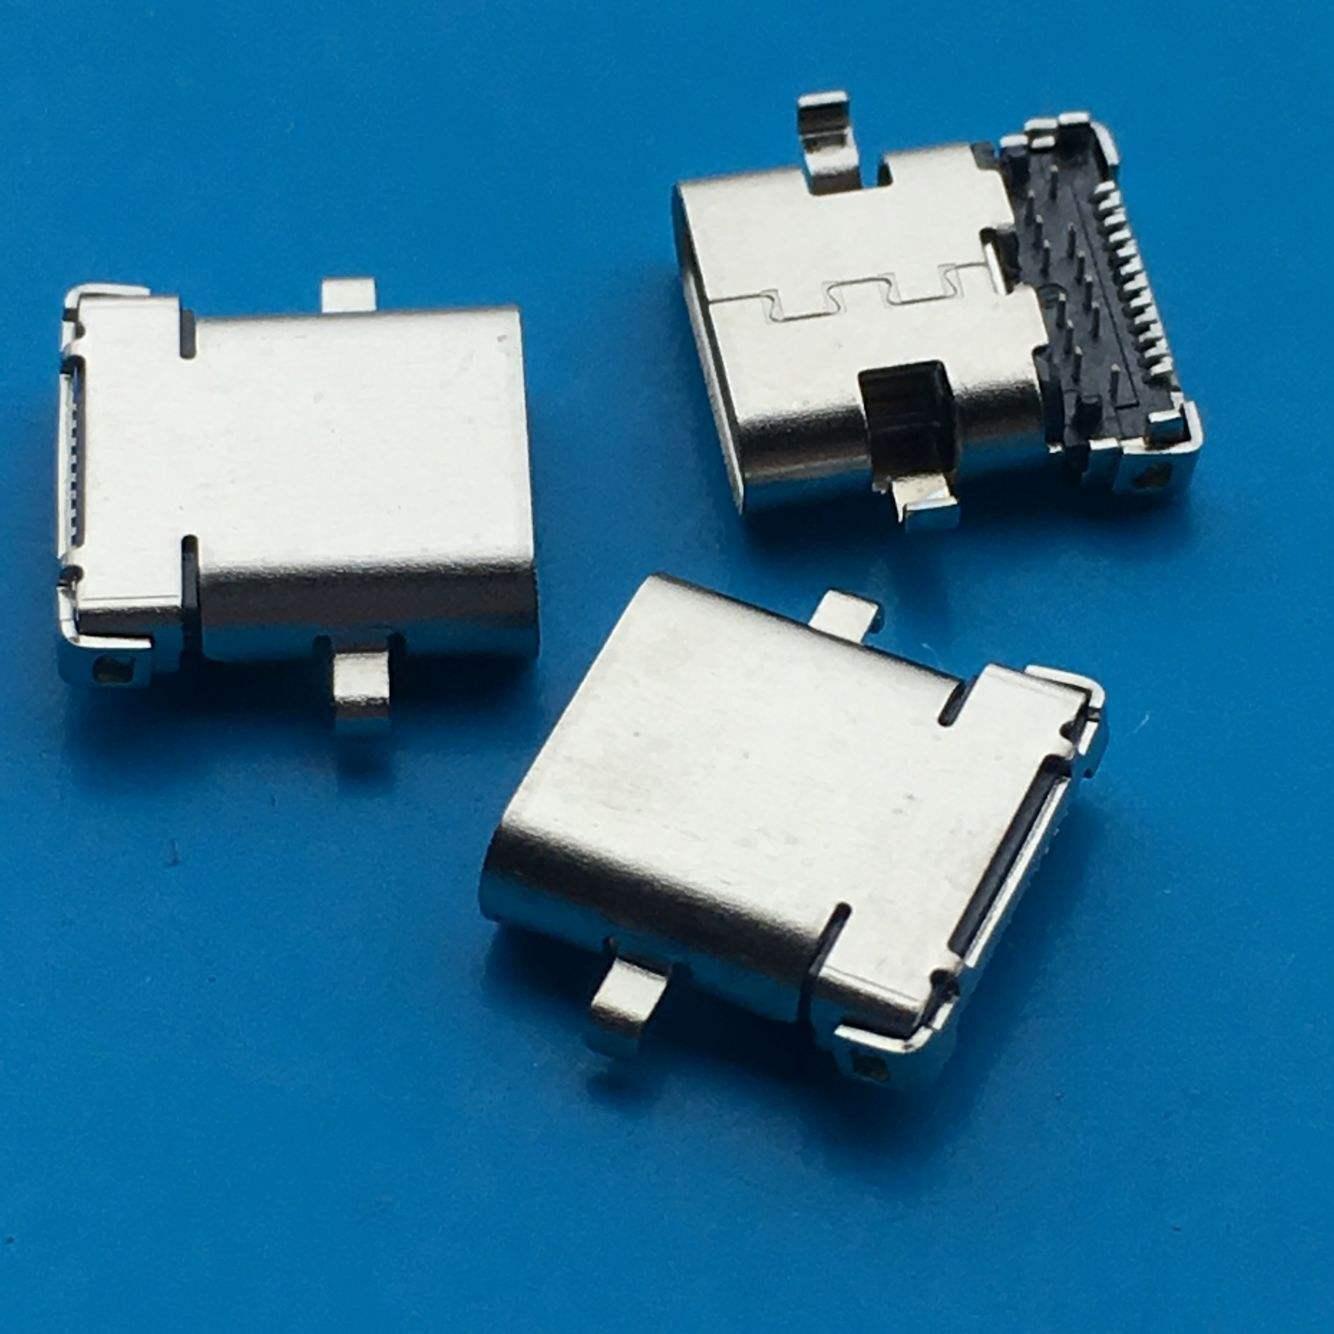 H907-HF-RN弹性环氧 Type-c连接器密封防水胶水 充电接口封装胶气密性好